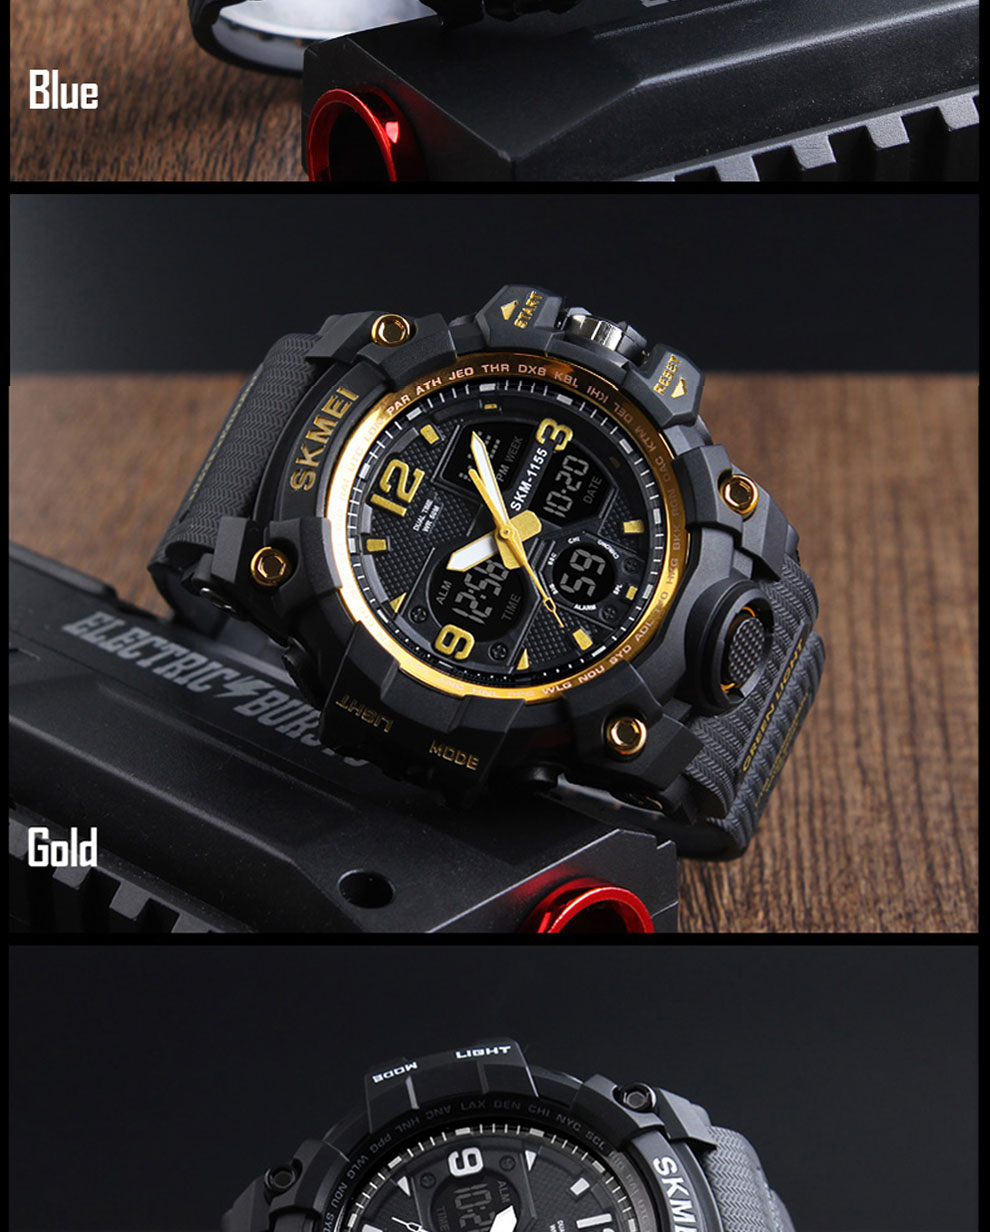 HTB14SRwRwHqK1RjSZJnq6zNLpXaq SKMEI Brand Luxury Military Sports Watches Men Quartz Analog LED Digital Clock Man Waterproof Dual Display Wristwatches Relogio